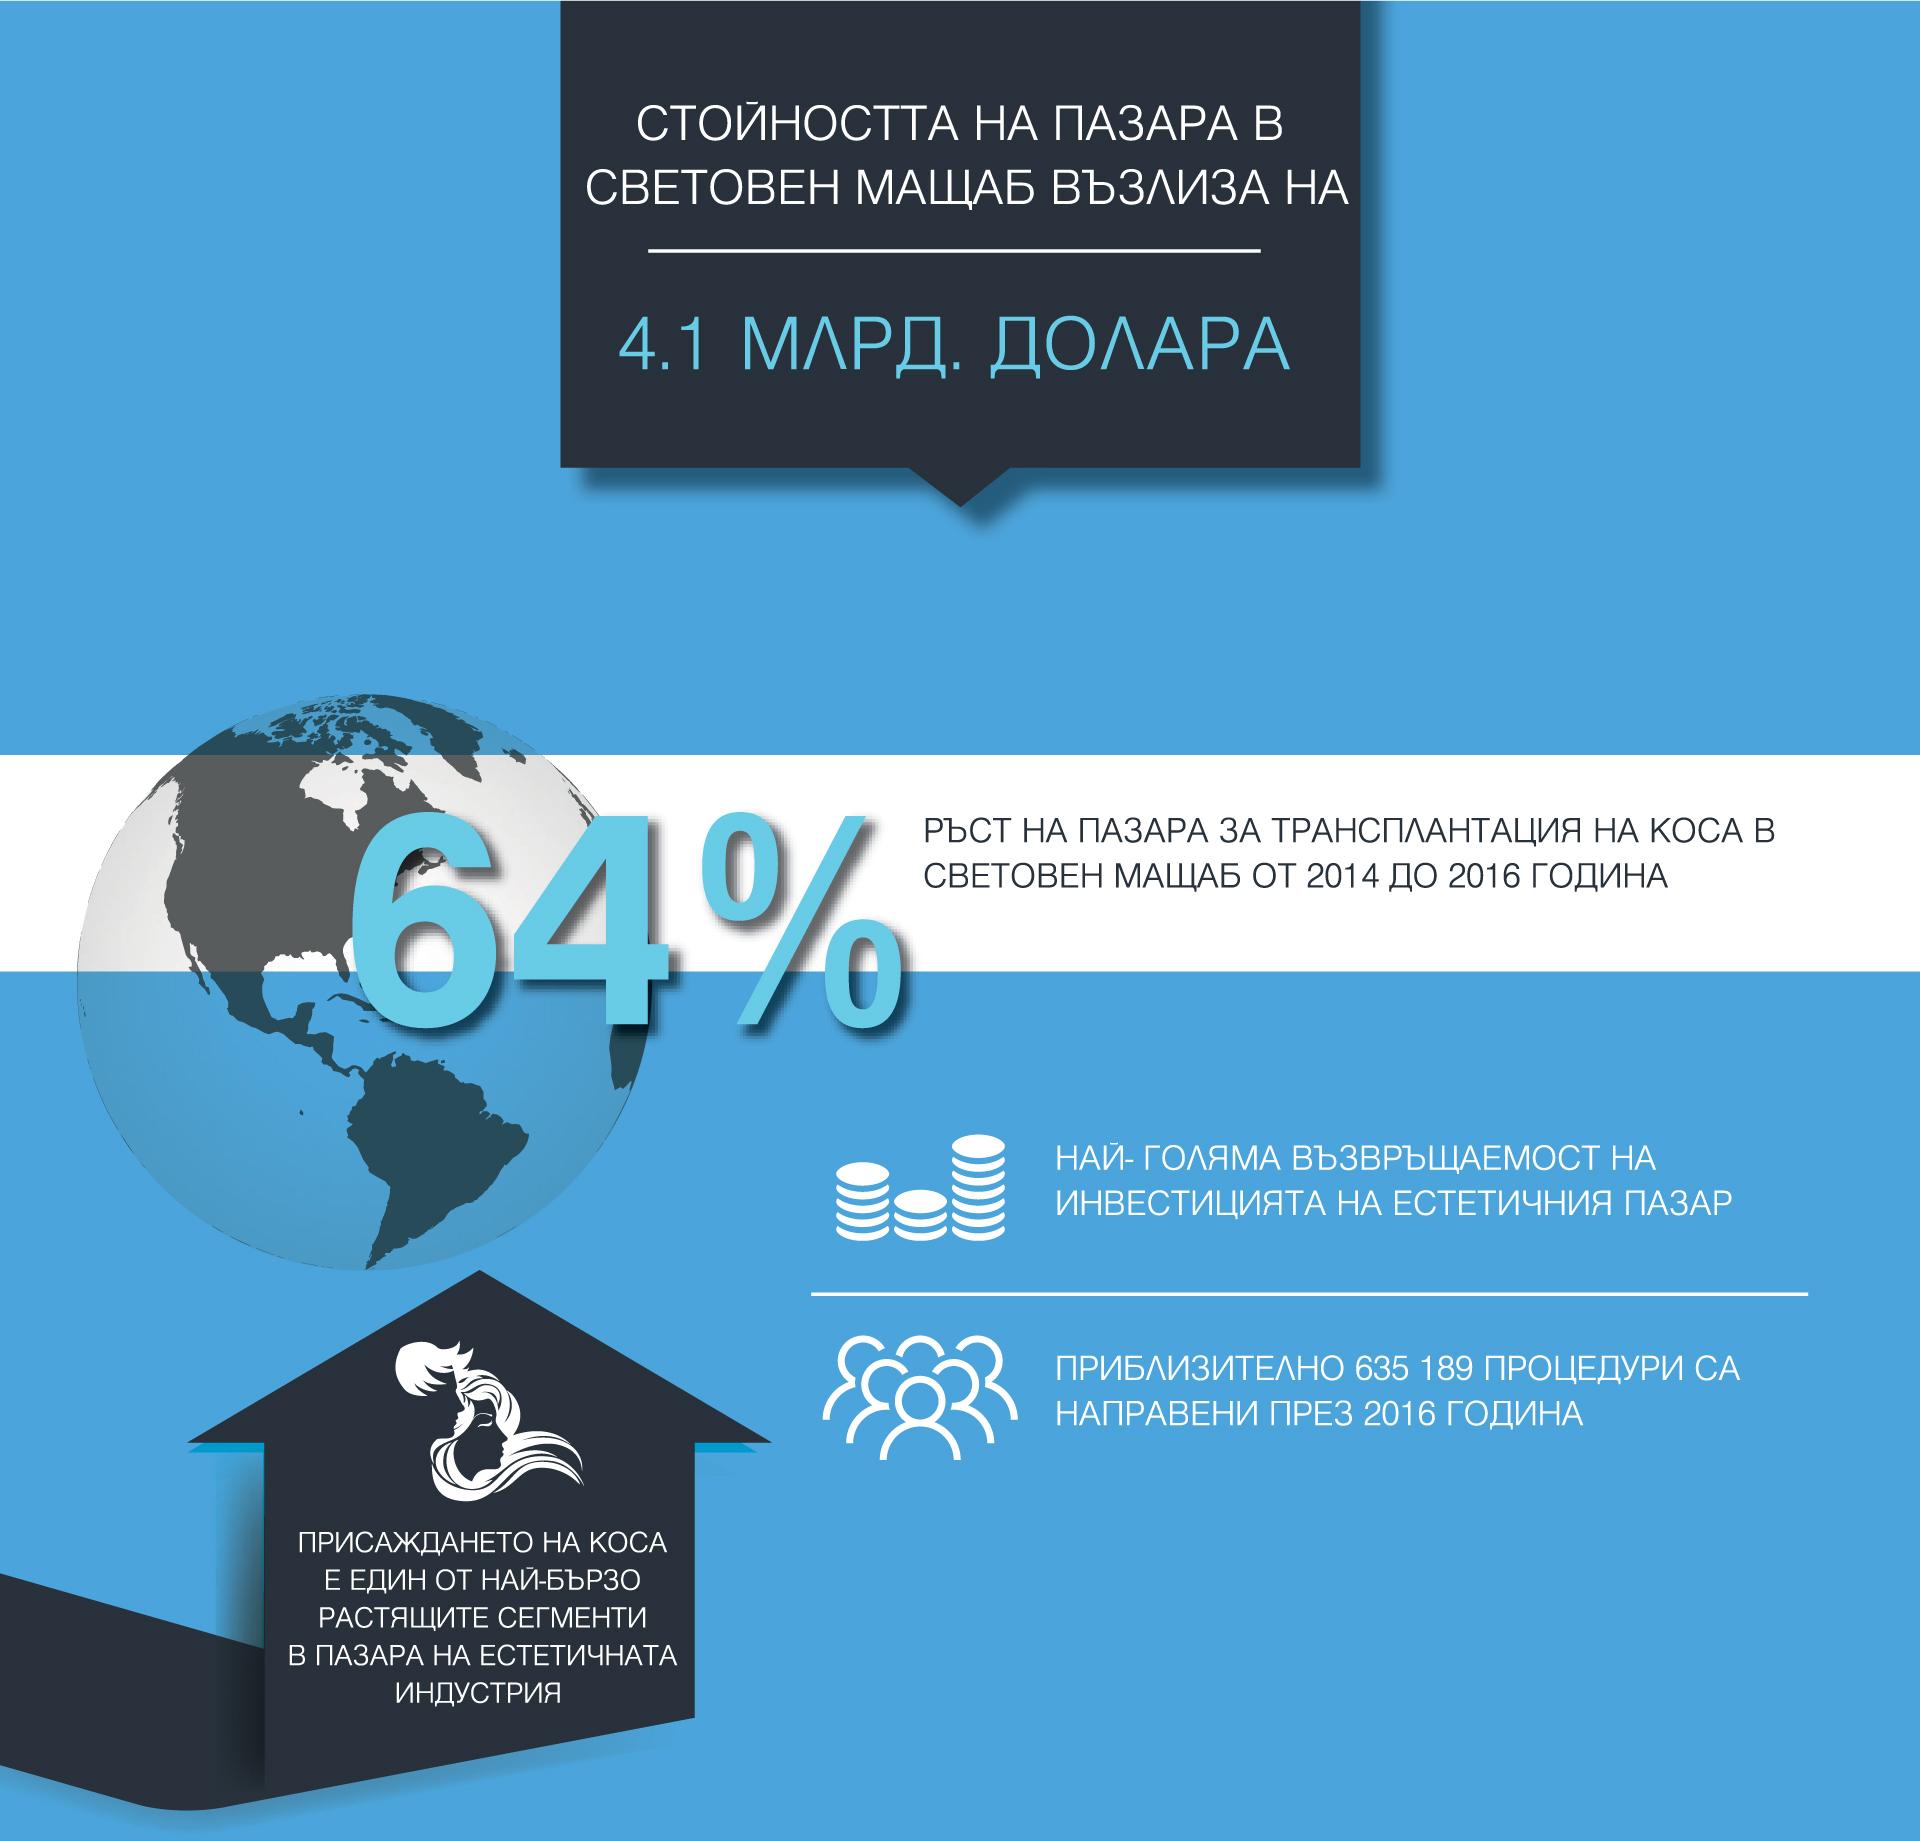 smartgrat-statistika-prouchvane-prisajdane-transplantacia-kosa